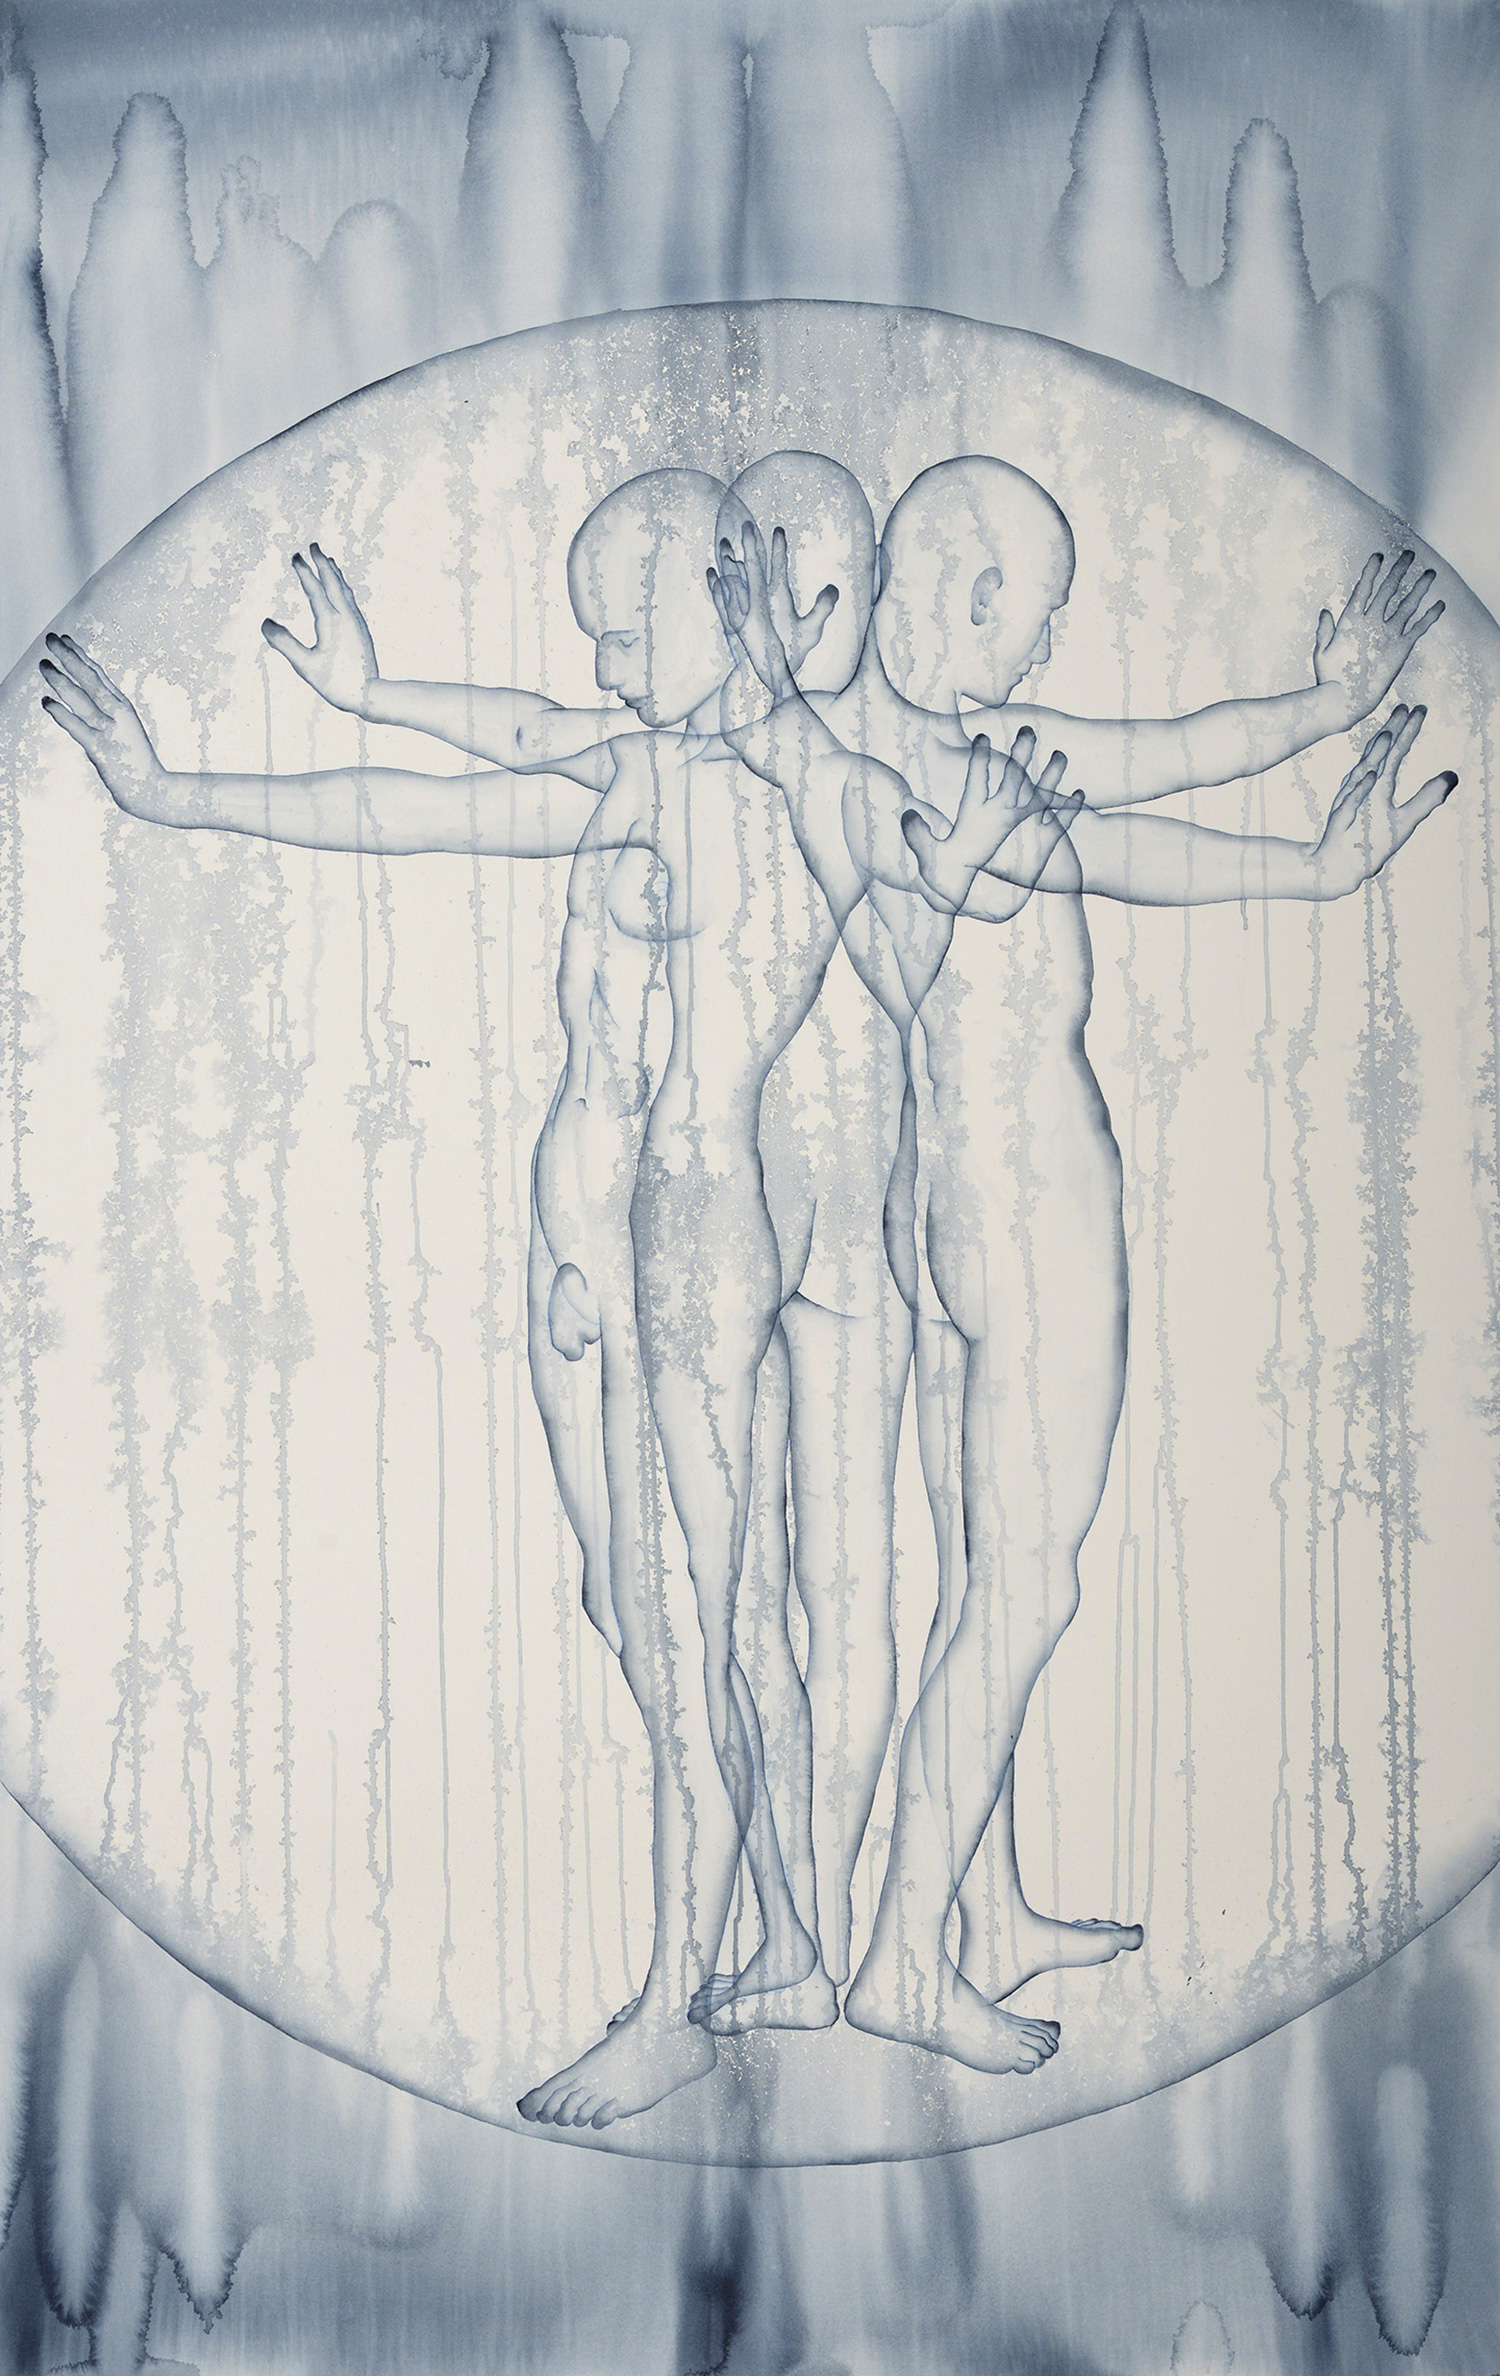 Stefano Bolzano, Aurea emotiva, acquarello su carta, 86x135 cm, 2020.